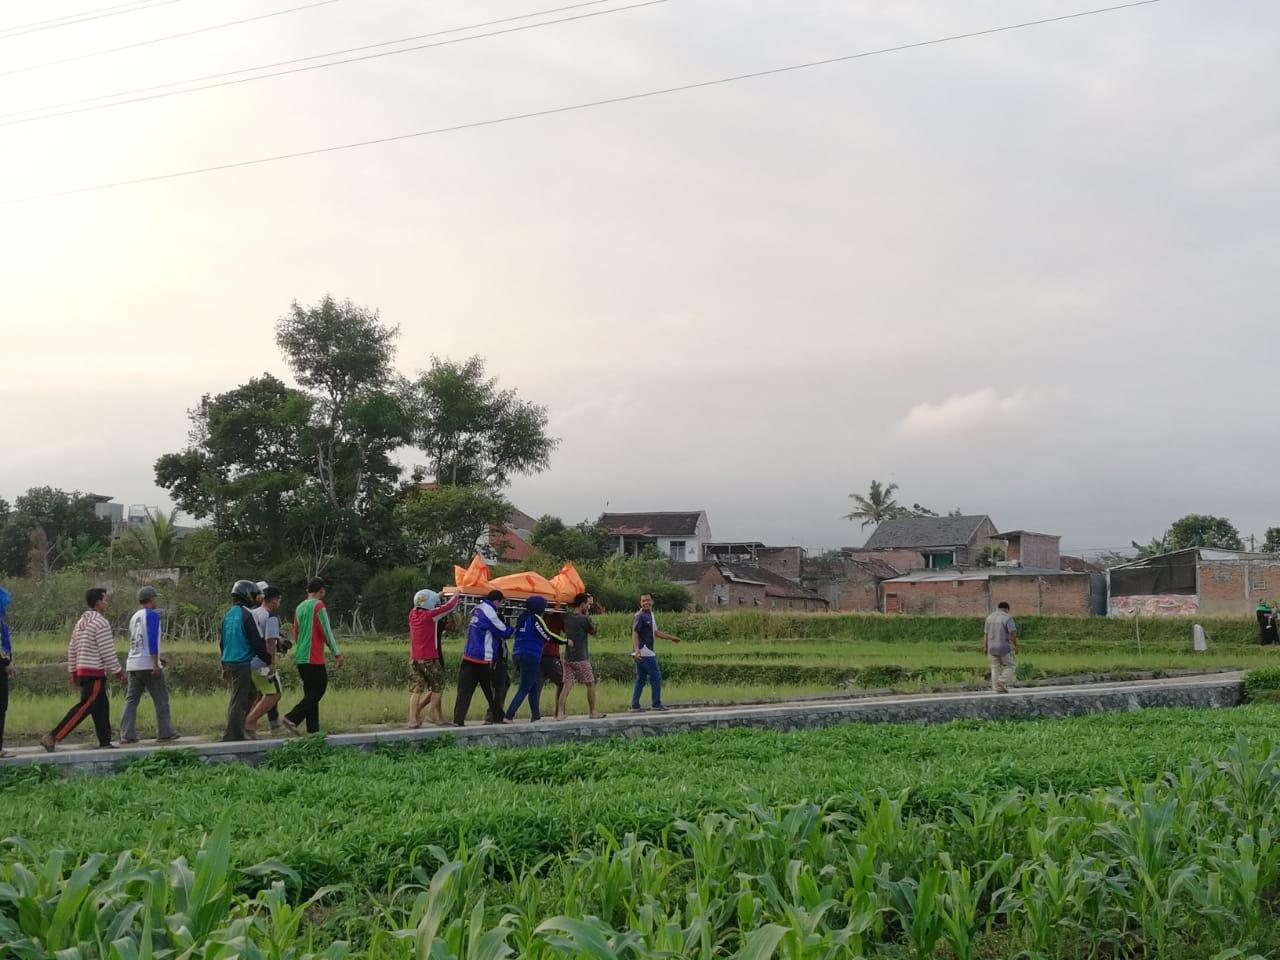 Warga mengerumuni saat petugas mengevakuasi mayat di tengah sawah Dusun Mojorejo, Desa Pendem, Kecamatan Junrejo, Sabtu (3/8/2019). (Foto: istimewa)